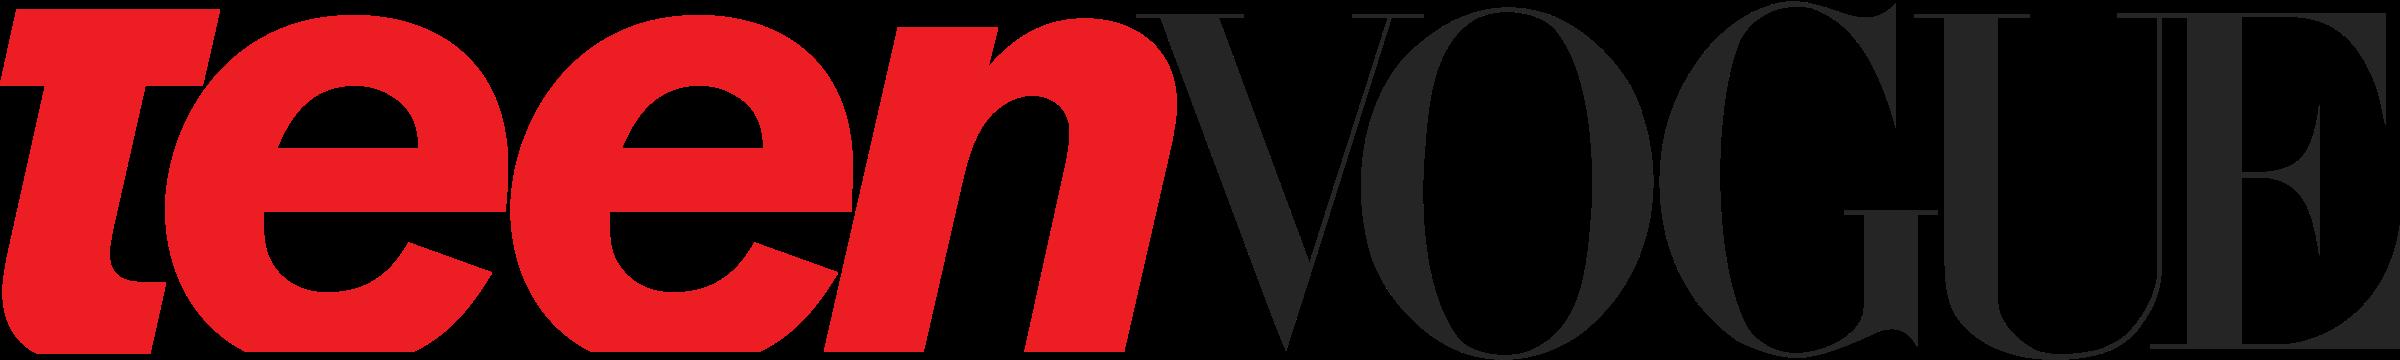 teen-vogue-logo-png-transparent.png